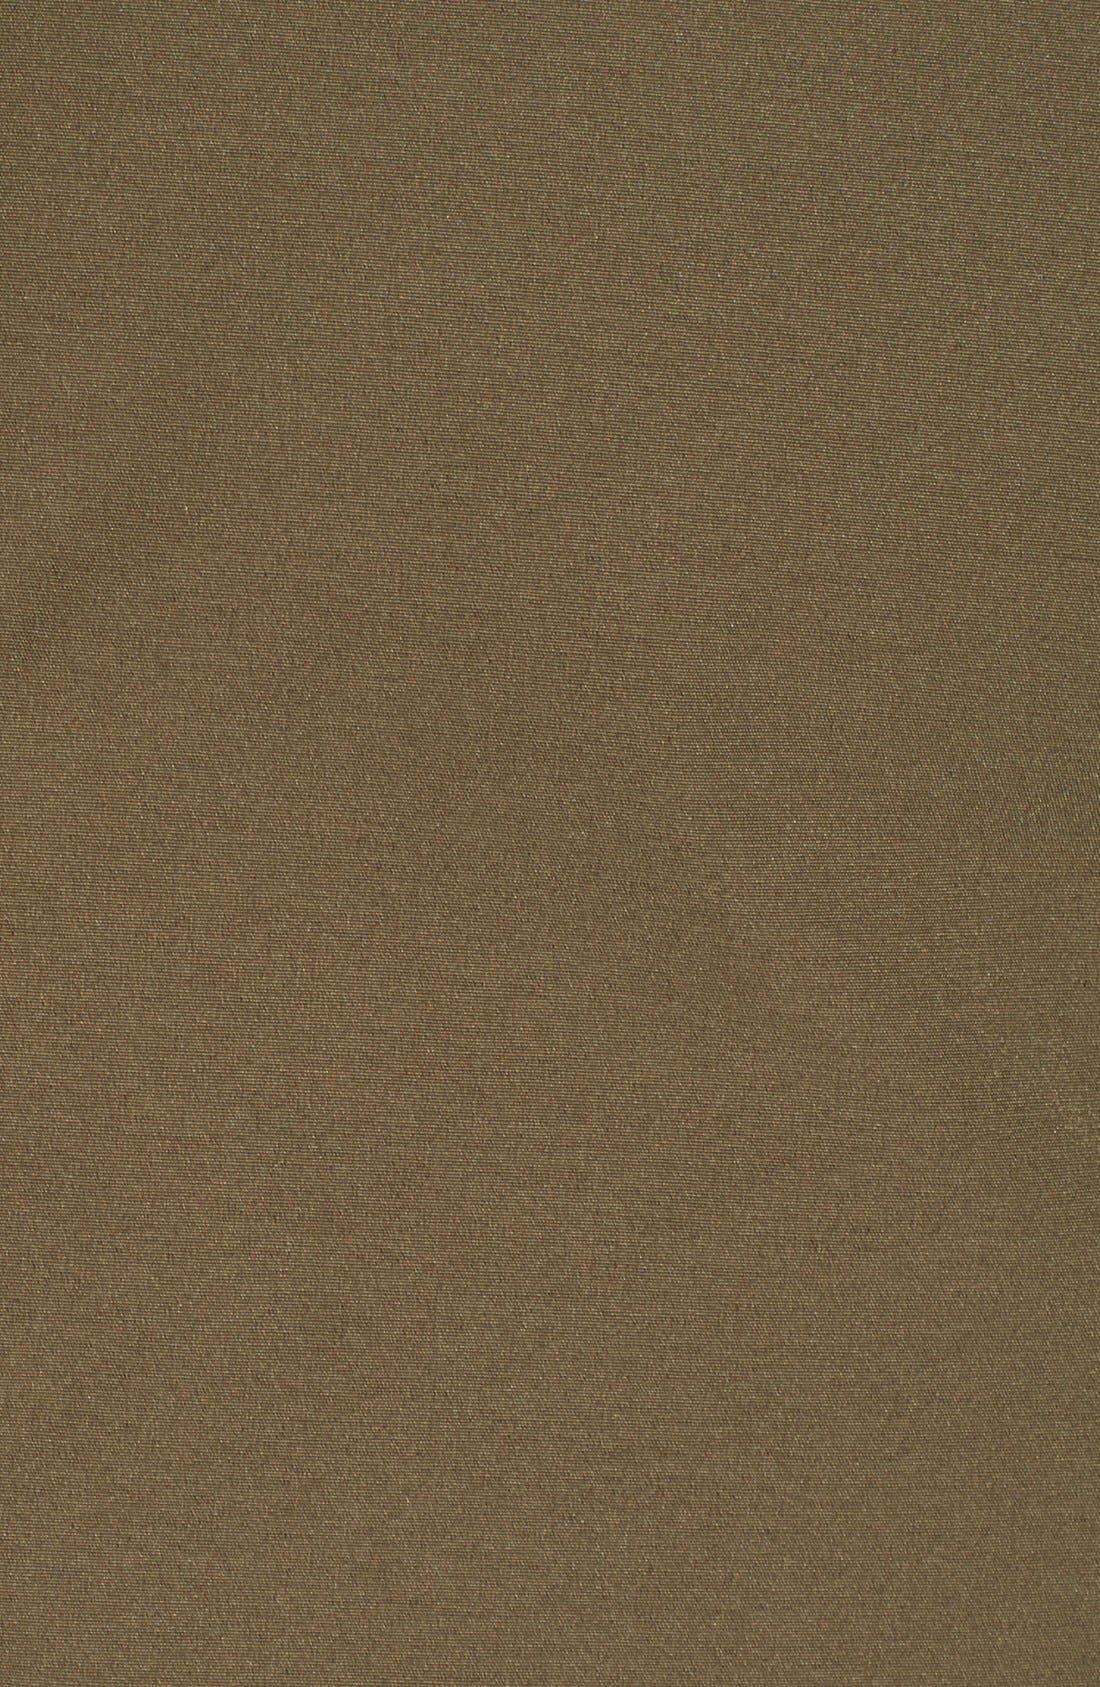 'Chateau' Slim Fit Genuine Coyote Fur Trim Jacket,                             Alternate thumbnail 3, color,                             Military Green